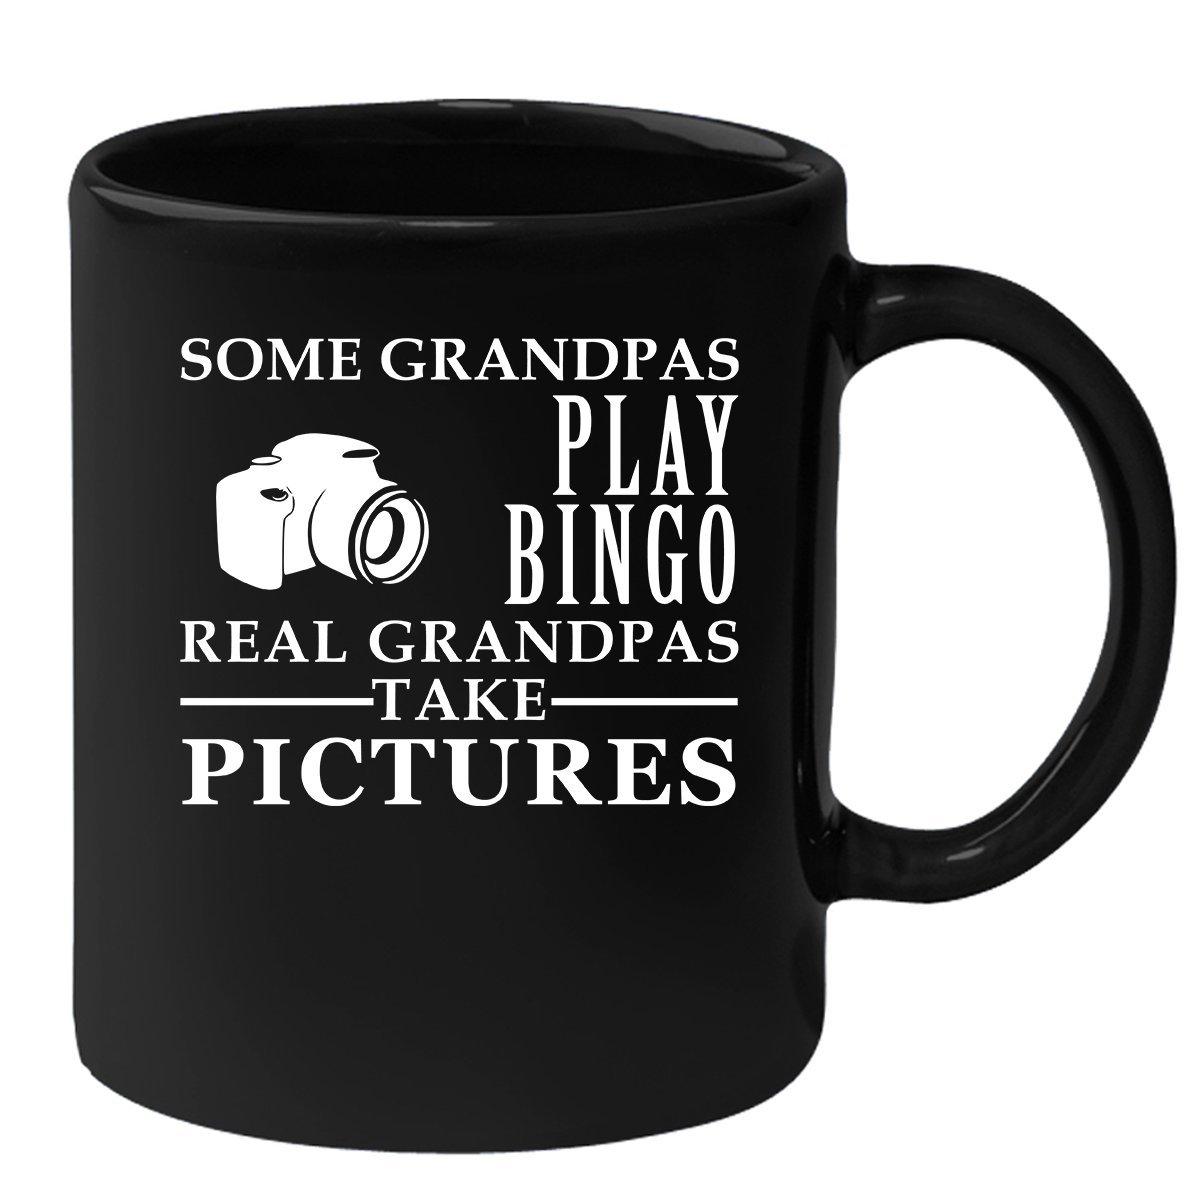 Grandpa Mug Funny Black Mug for Coffee 11oz Some Grandpas play bingo, real Grandpas take pictures